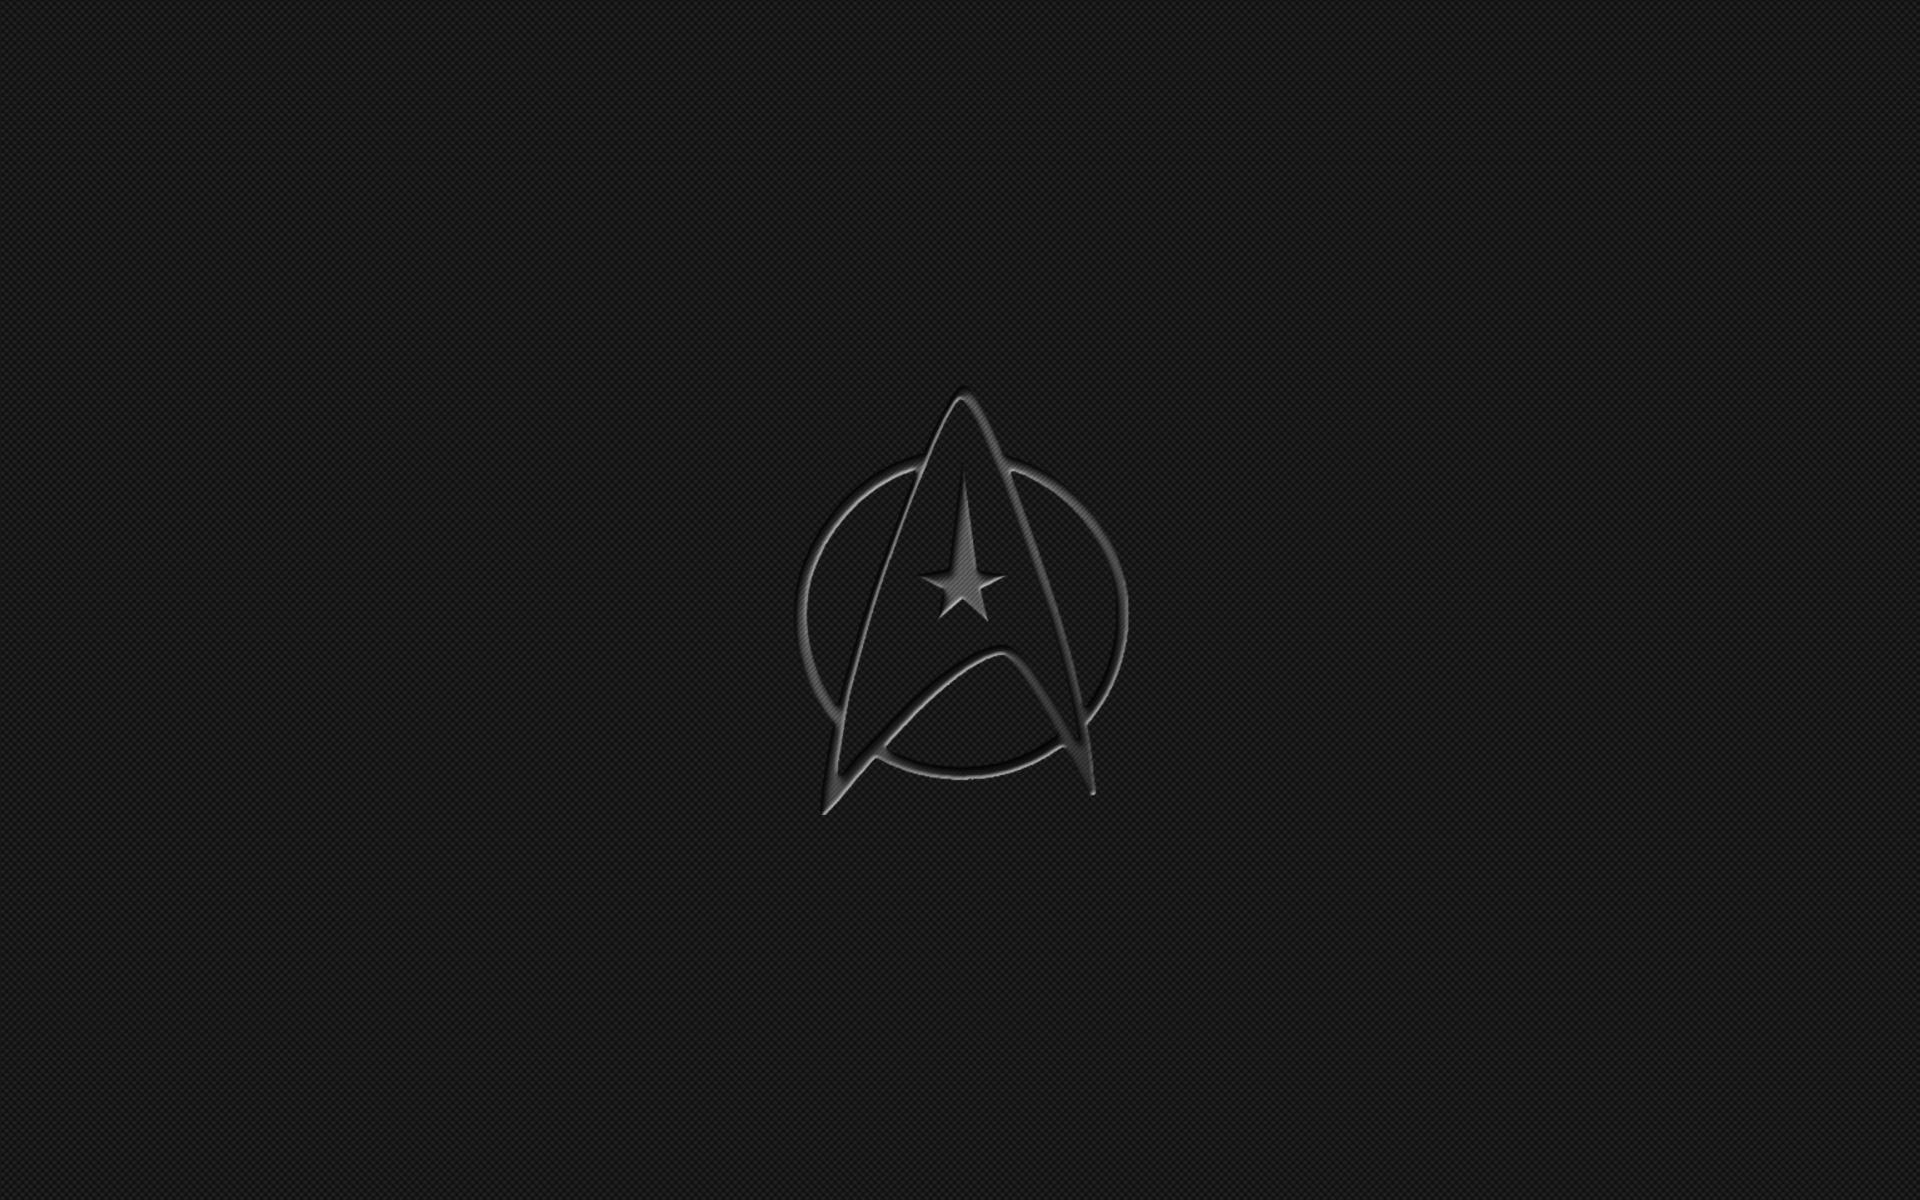 Star-trek-logo-desktop-background